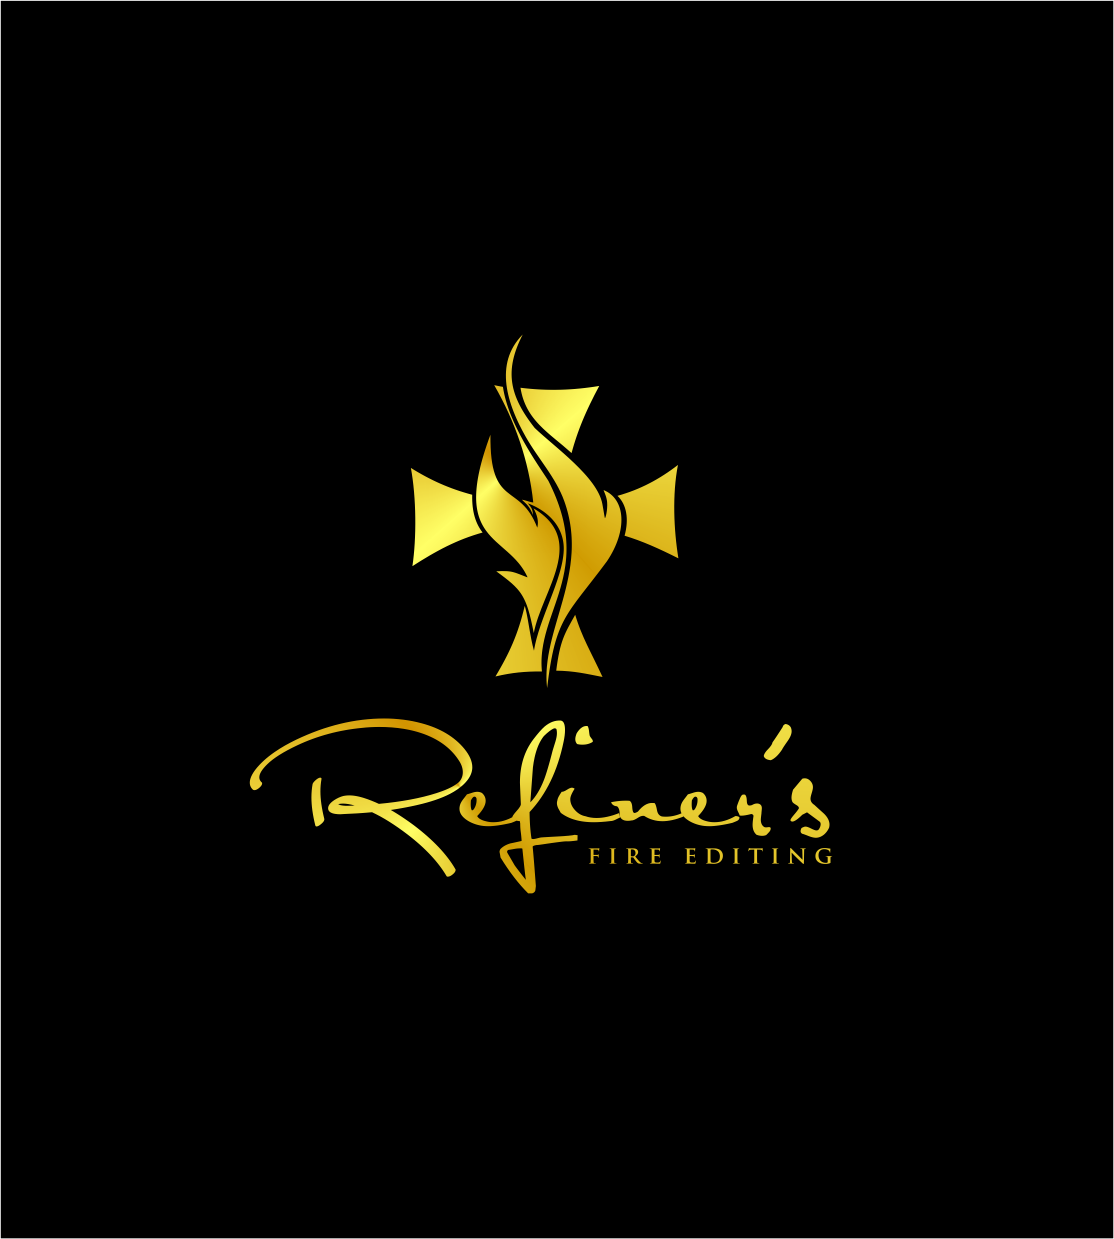 Photo editing service logo images